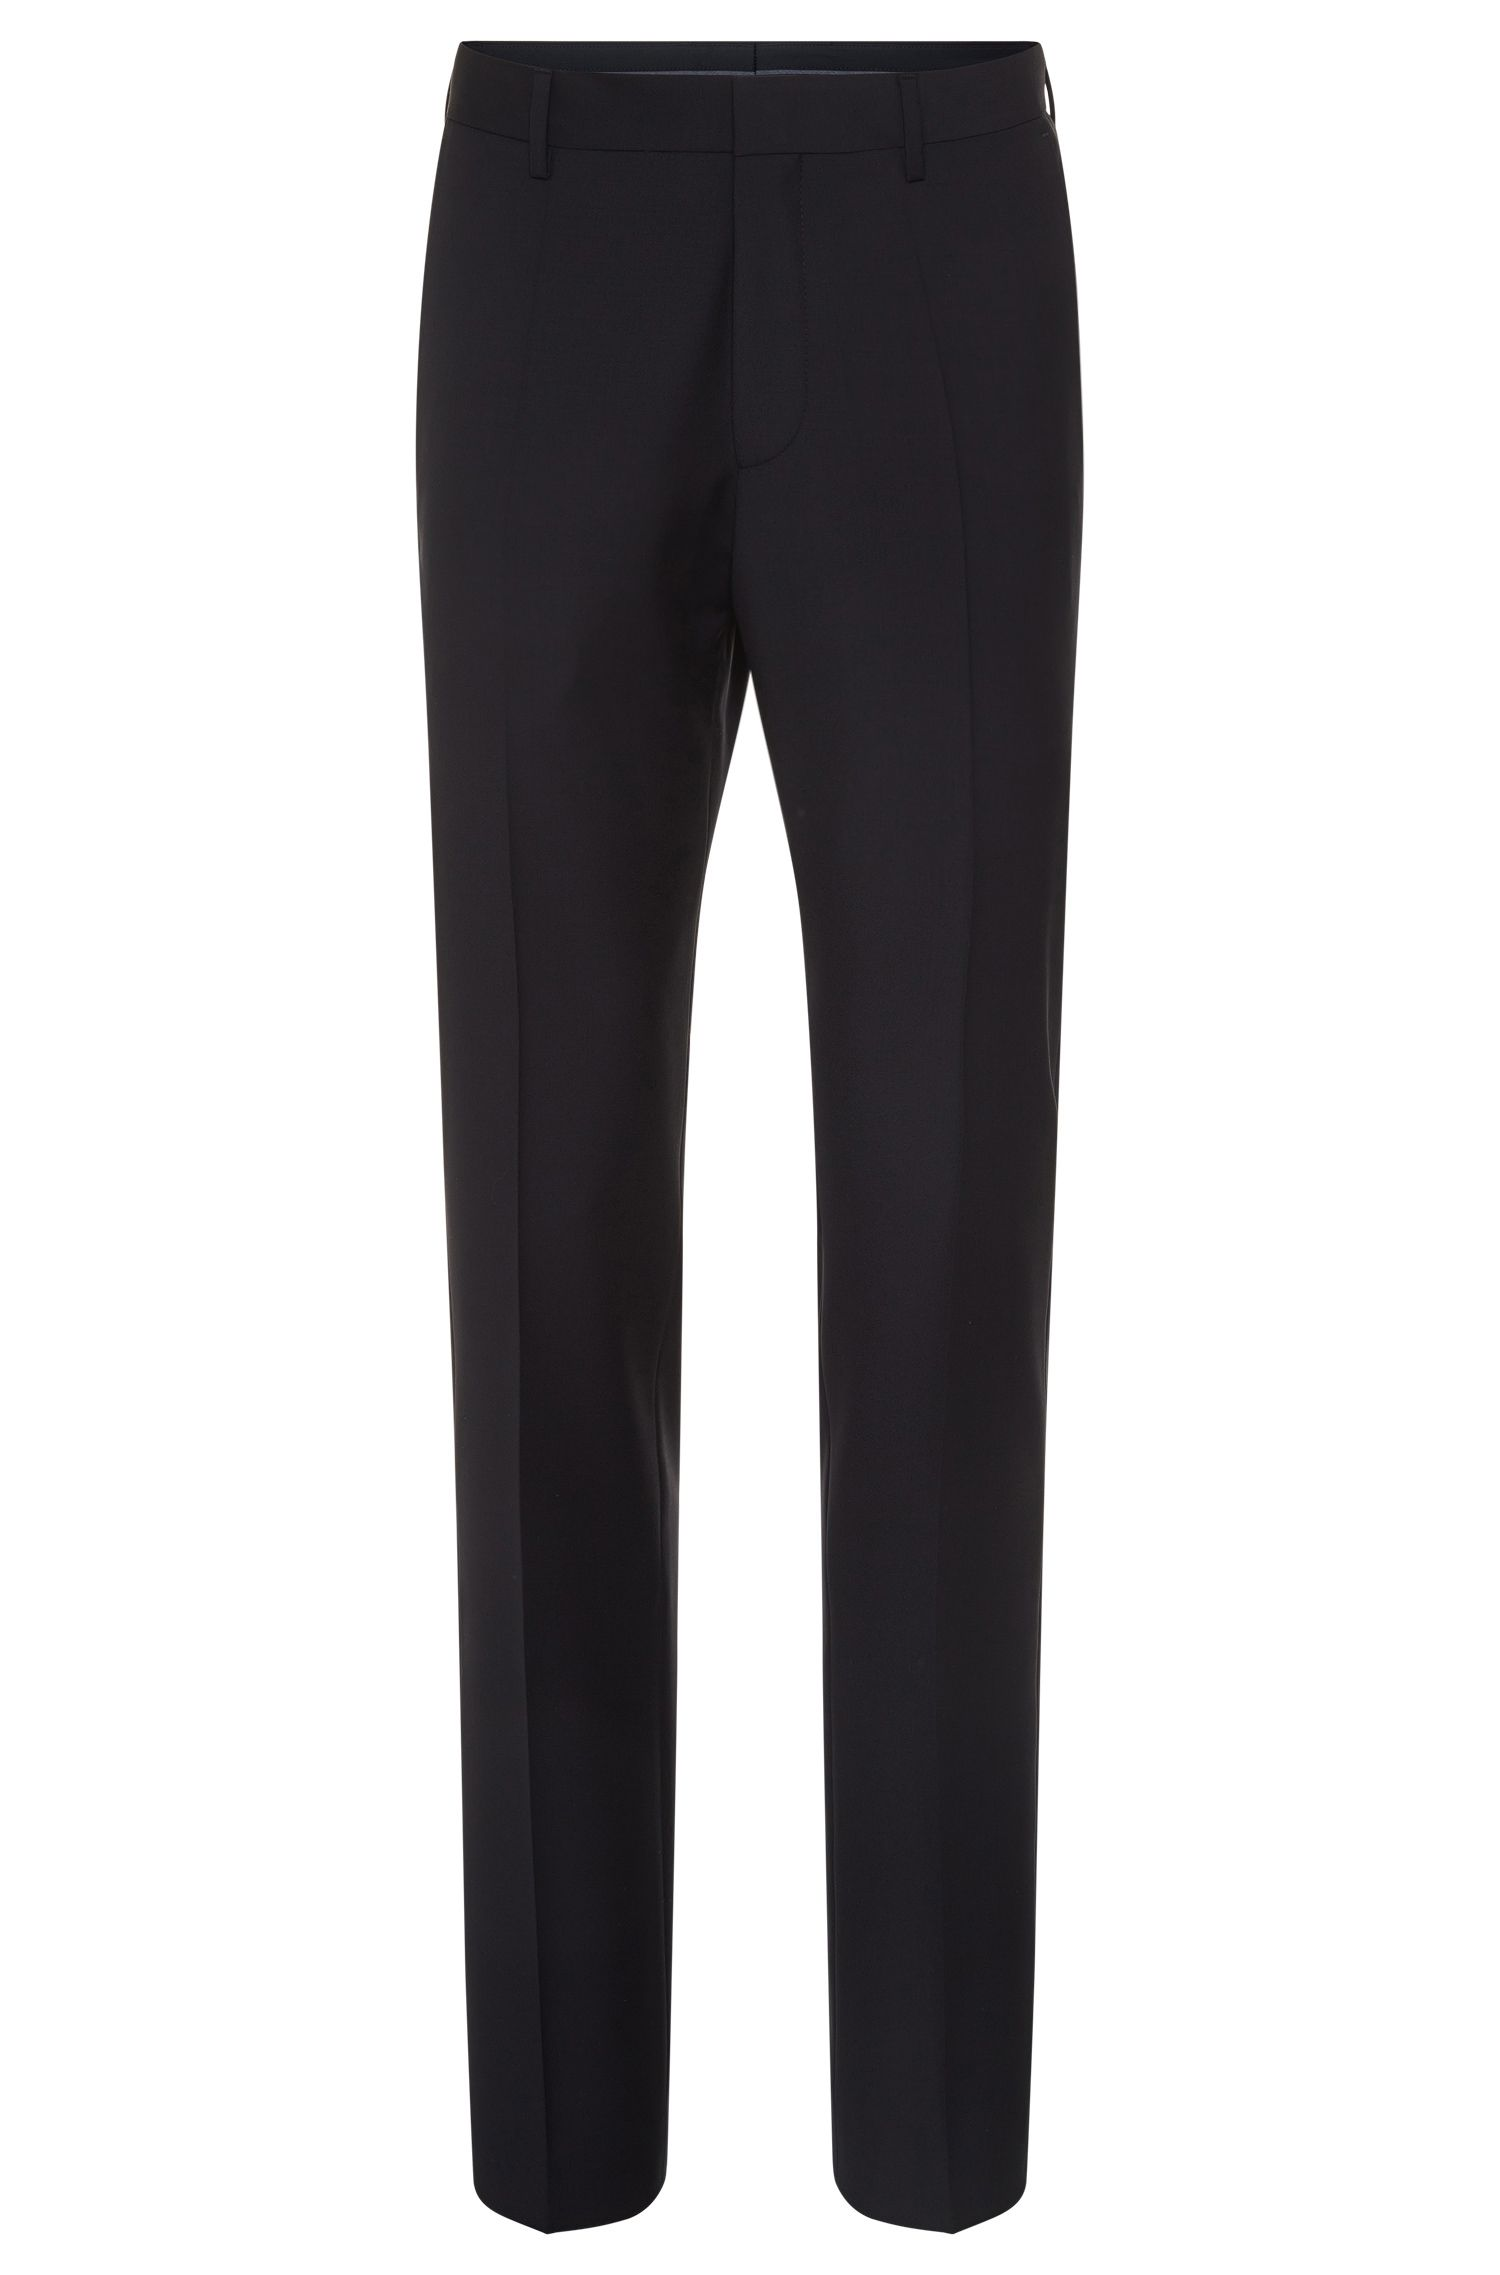 Pantalón slim fit en mezcla de lana virgen con cachemira: 'Genesis2'